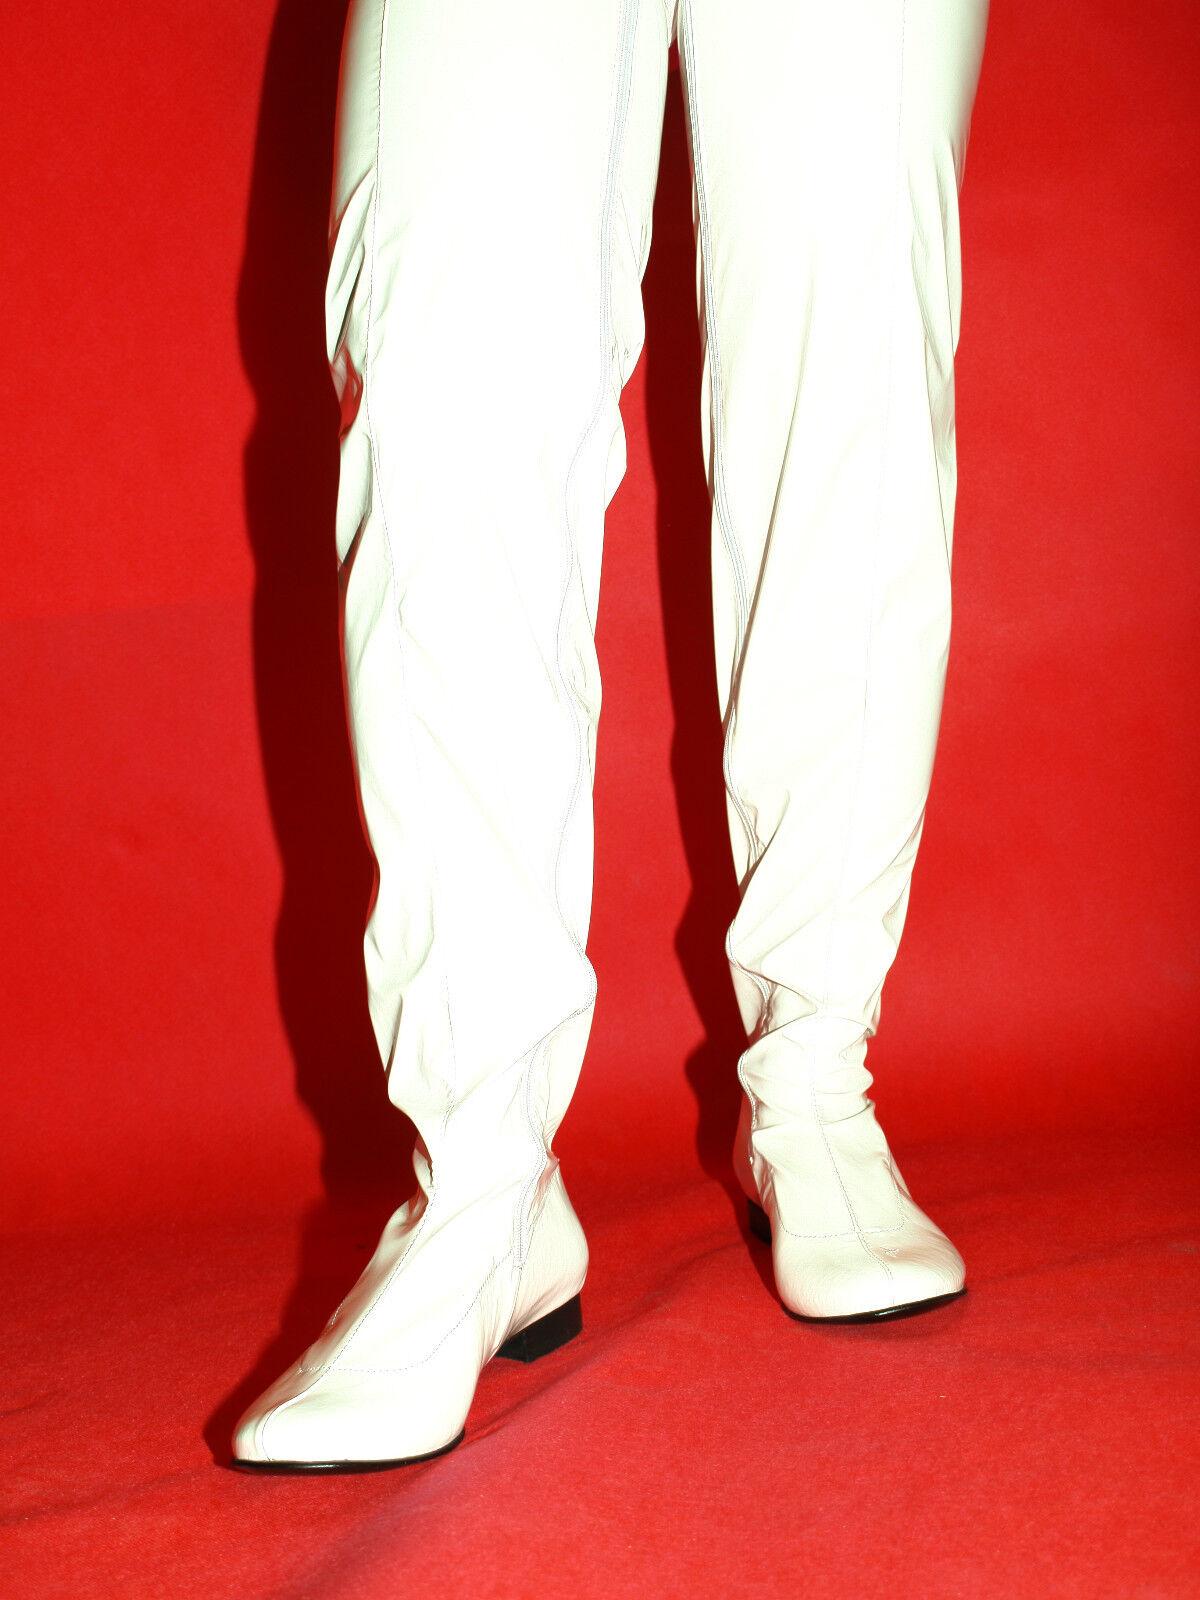 Stiefel latex gummi 100% - hels 0cm 0cm 0cm  - 37-47 producer -Polen    cec673